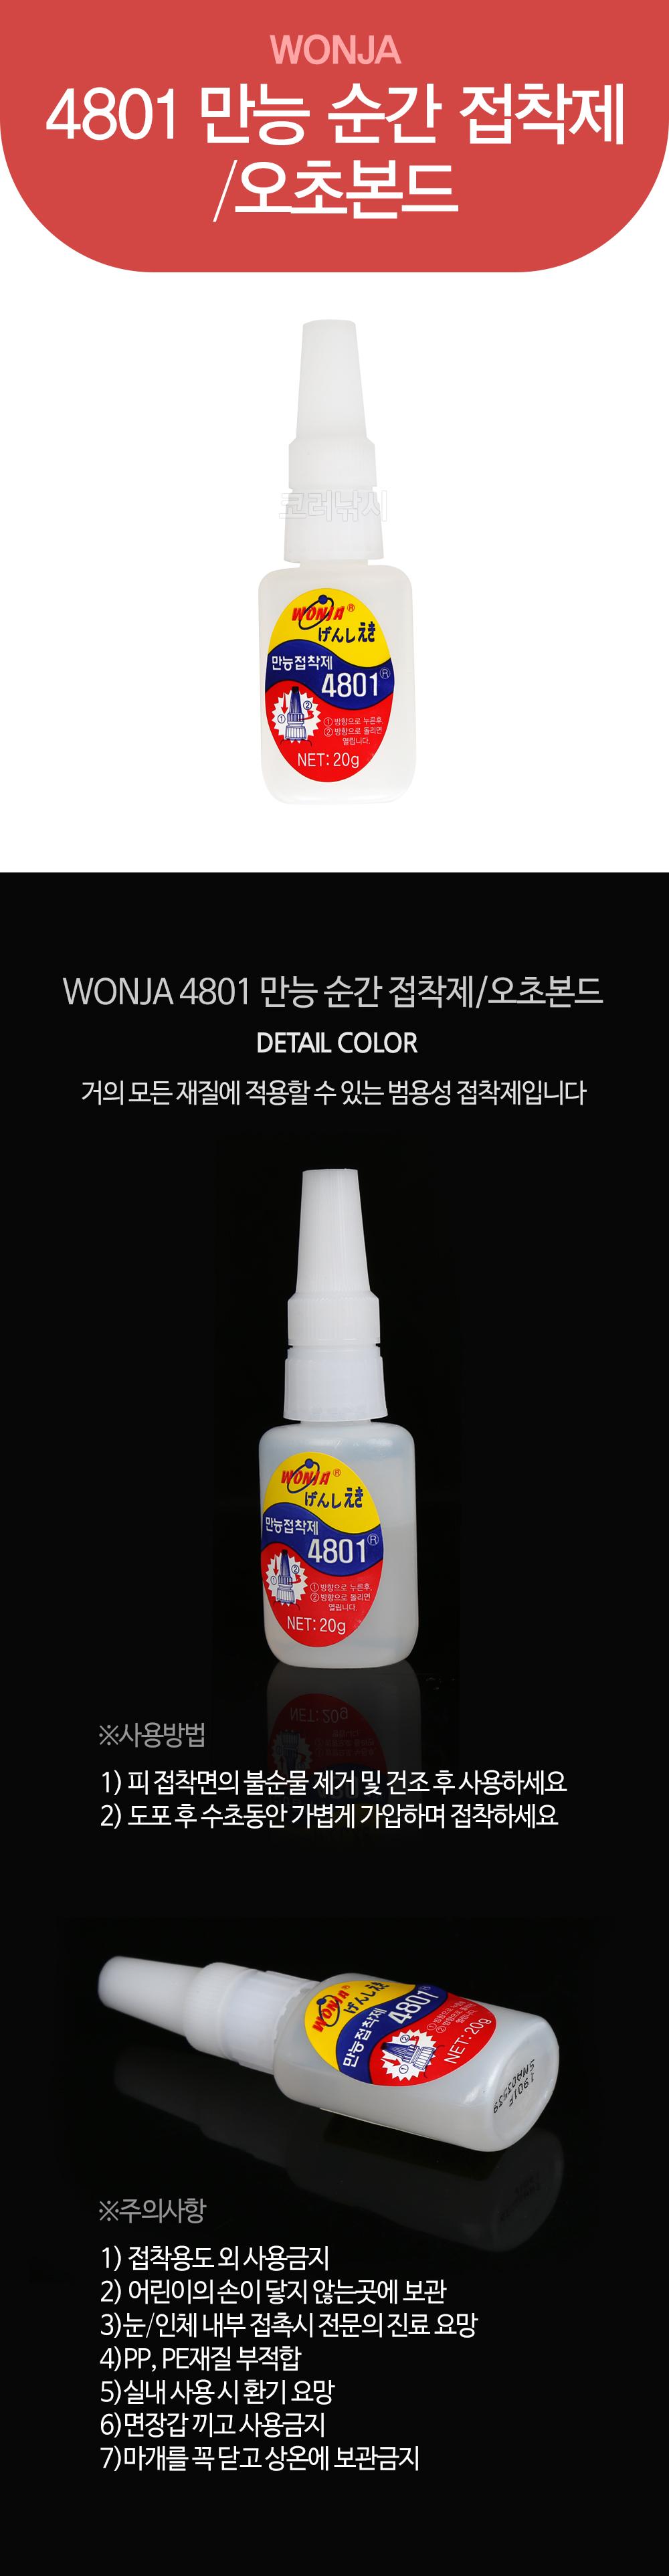 WONJA 4801 만능 순간 접착제/오초본드 5초본드 본드 접착제 풀 접착